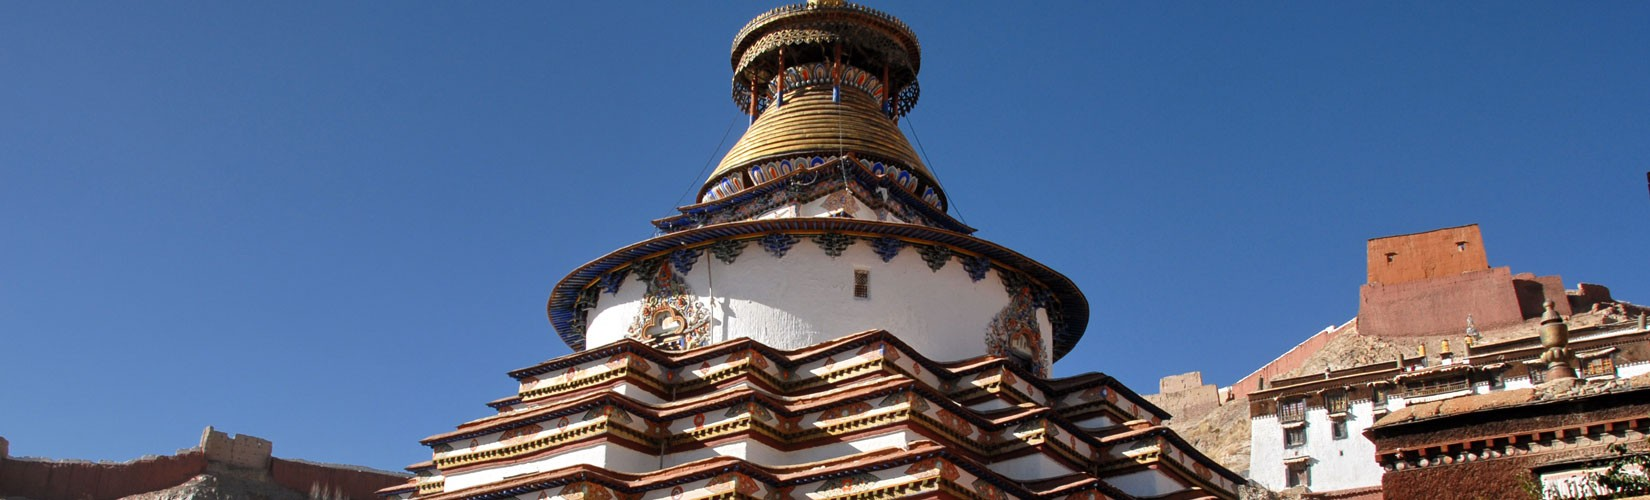 Overland Tibet Tour